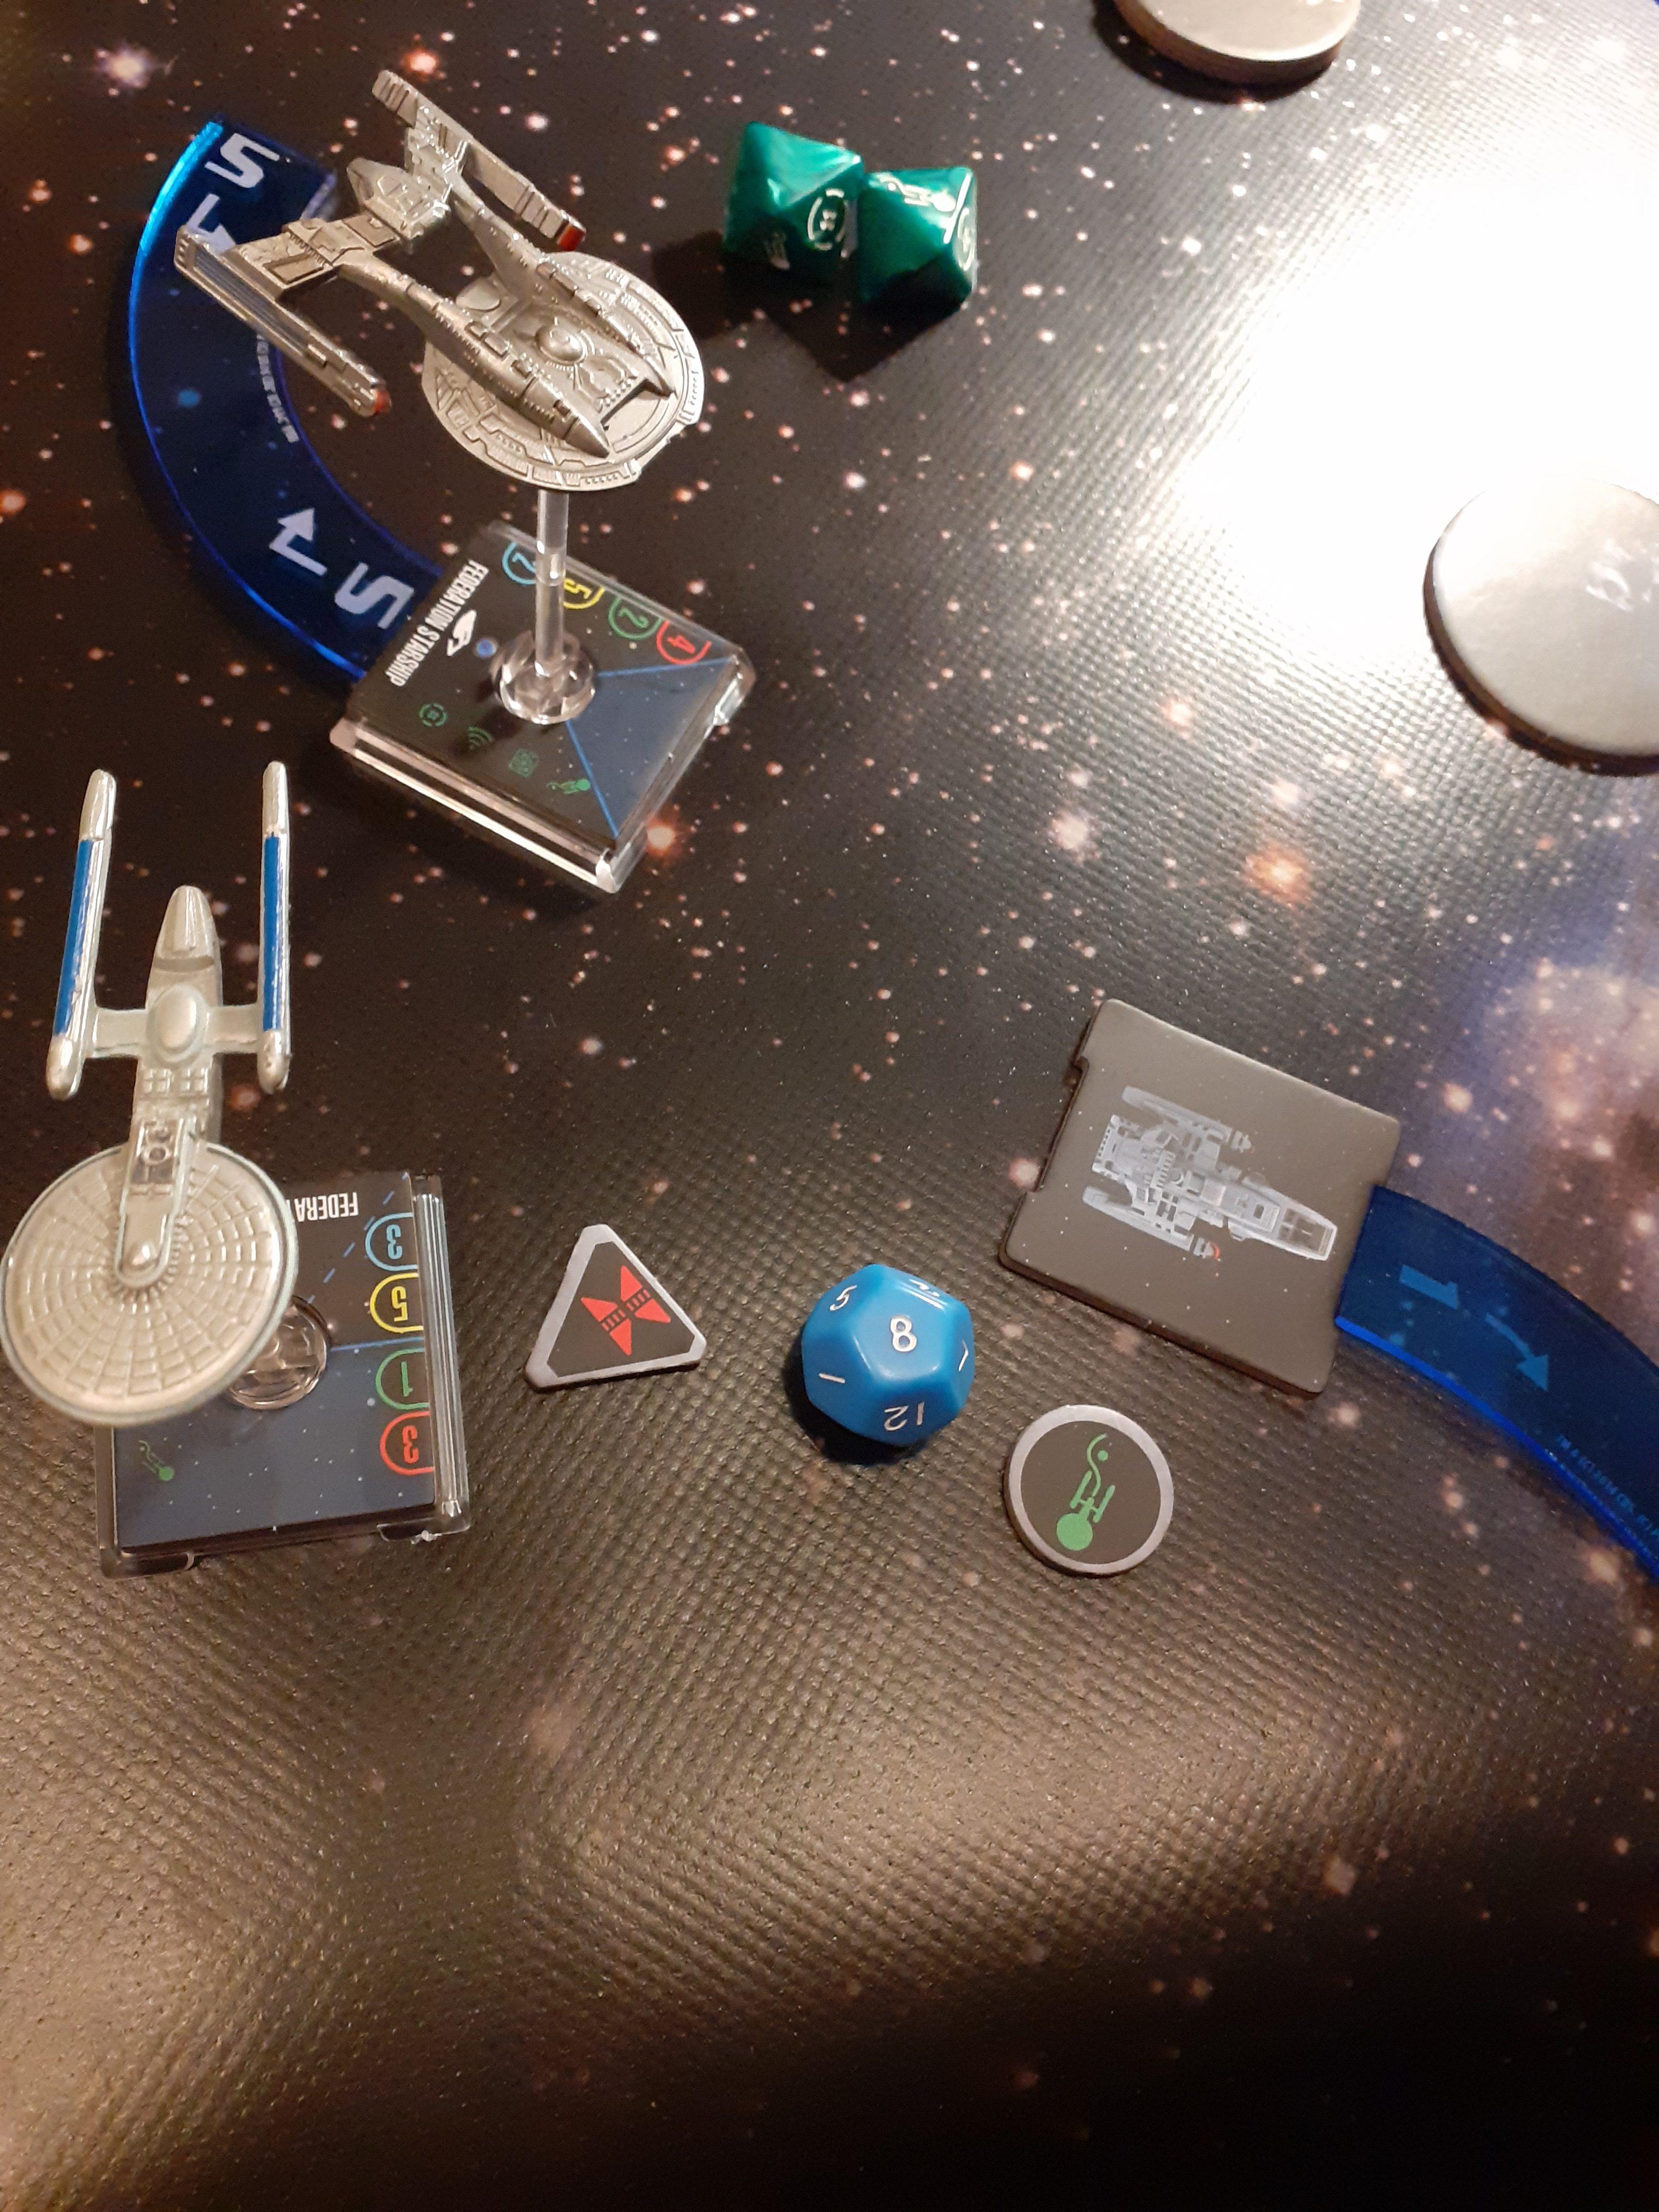 [Star Trek Alliance - Dominion War Campaign I] Computerlogbuch der Solo-Kampagne von Commander Cut  20210403_021410-e1617447461298